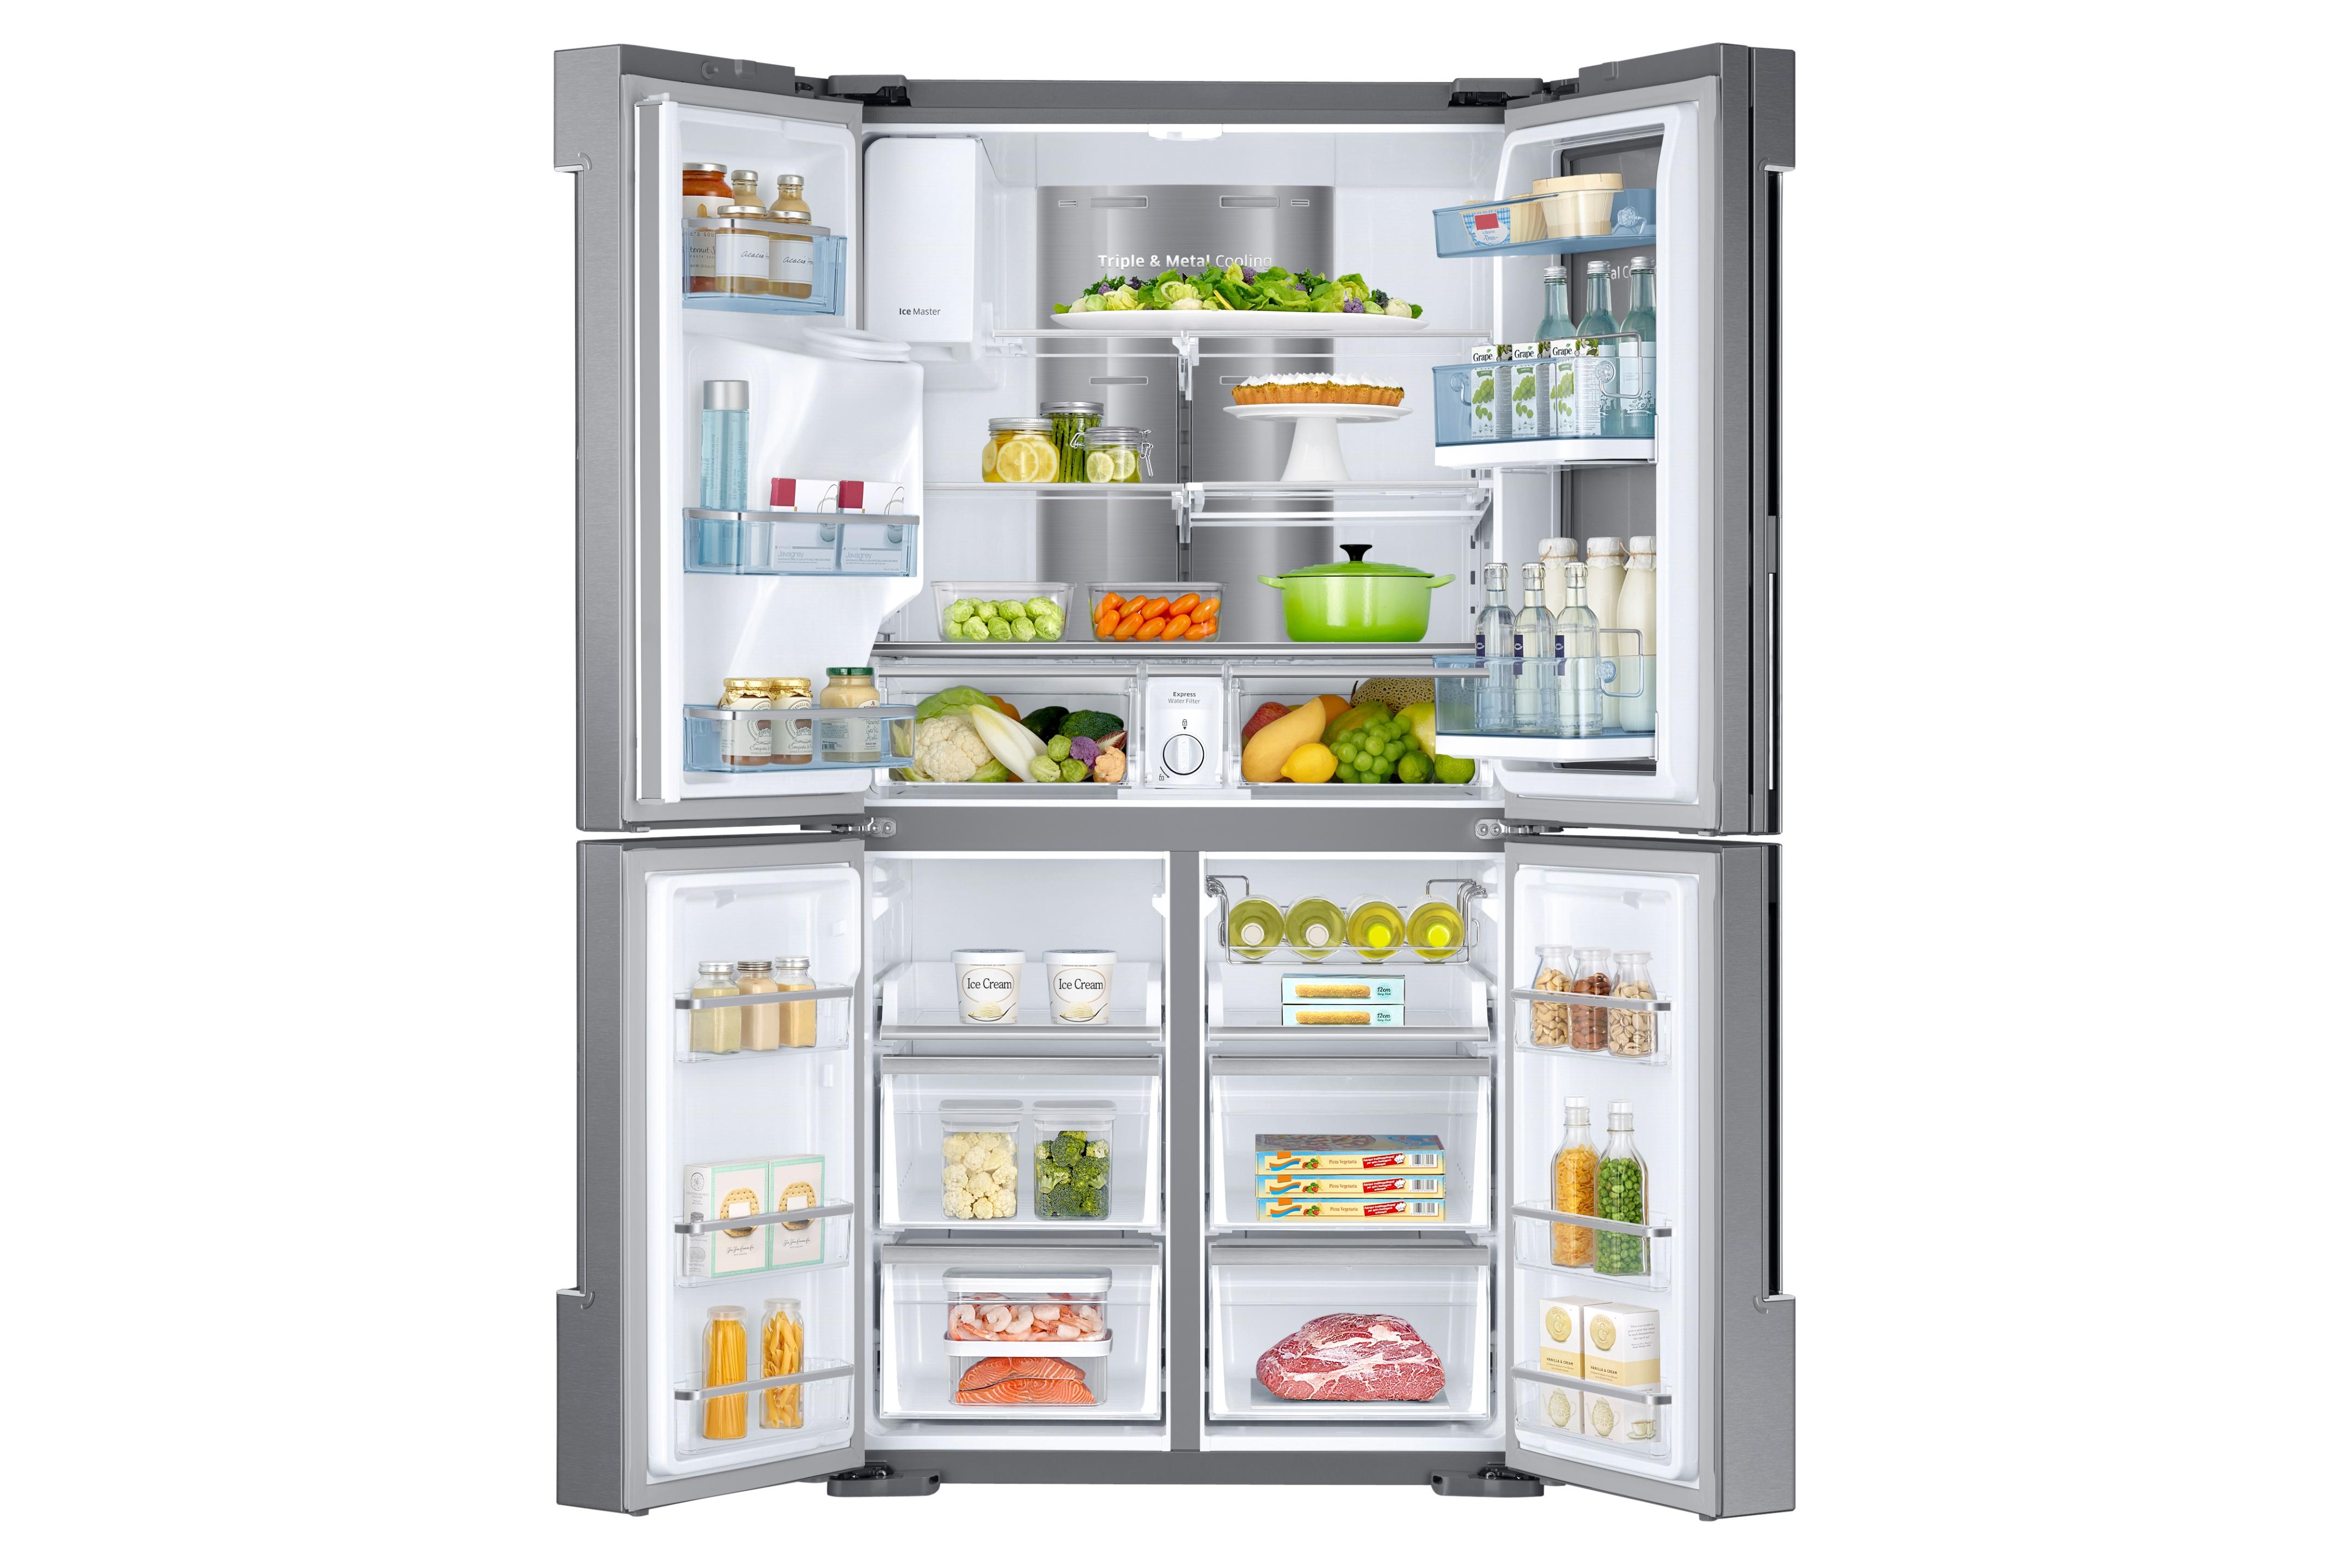 Samsung RF28K9380SR/AA 28 cu. ft. 4-Door Flex™ Food Showcase Refrigerator with FlexZone™ - Stainless Steel